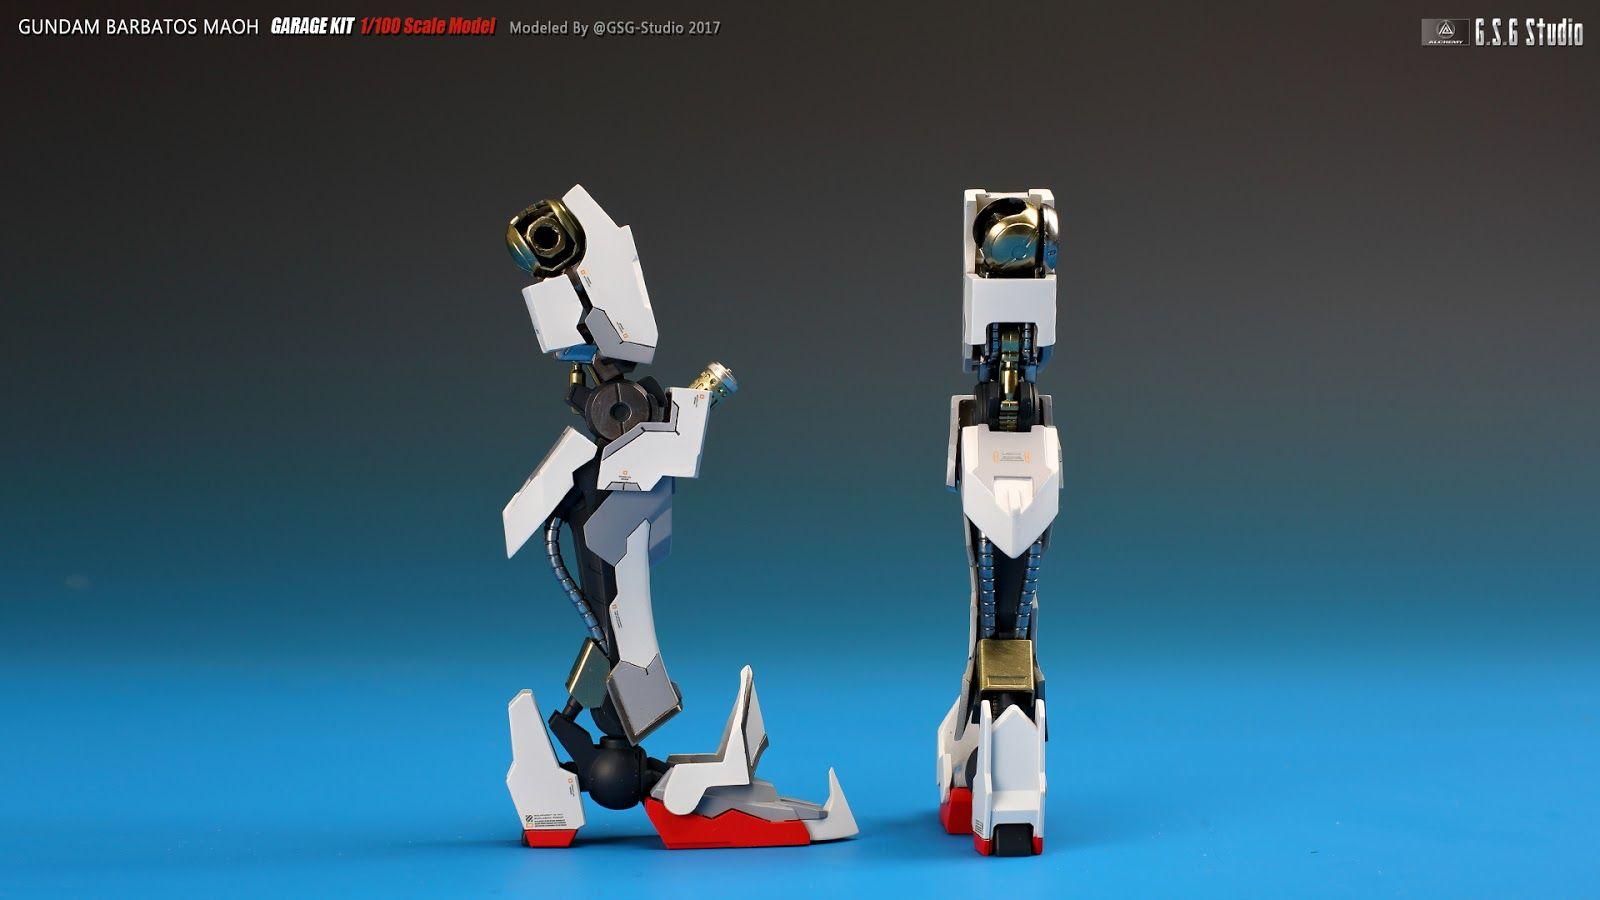 Gundam Barbatos Maoh - Custom Build     Modeled by GSG-Studio